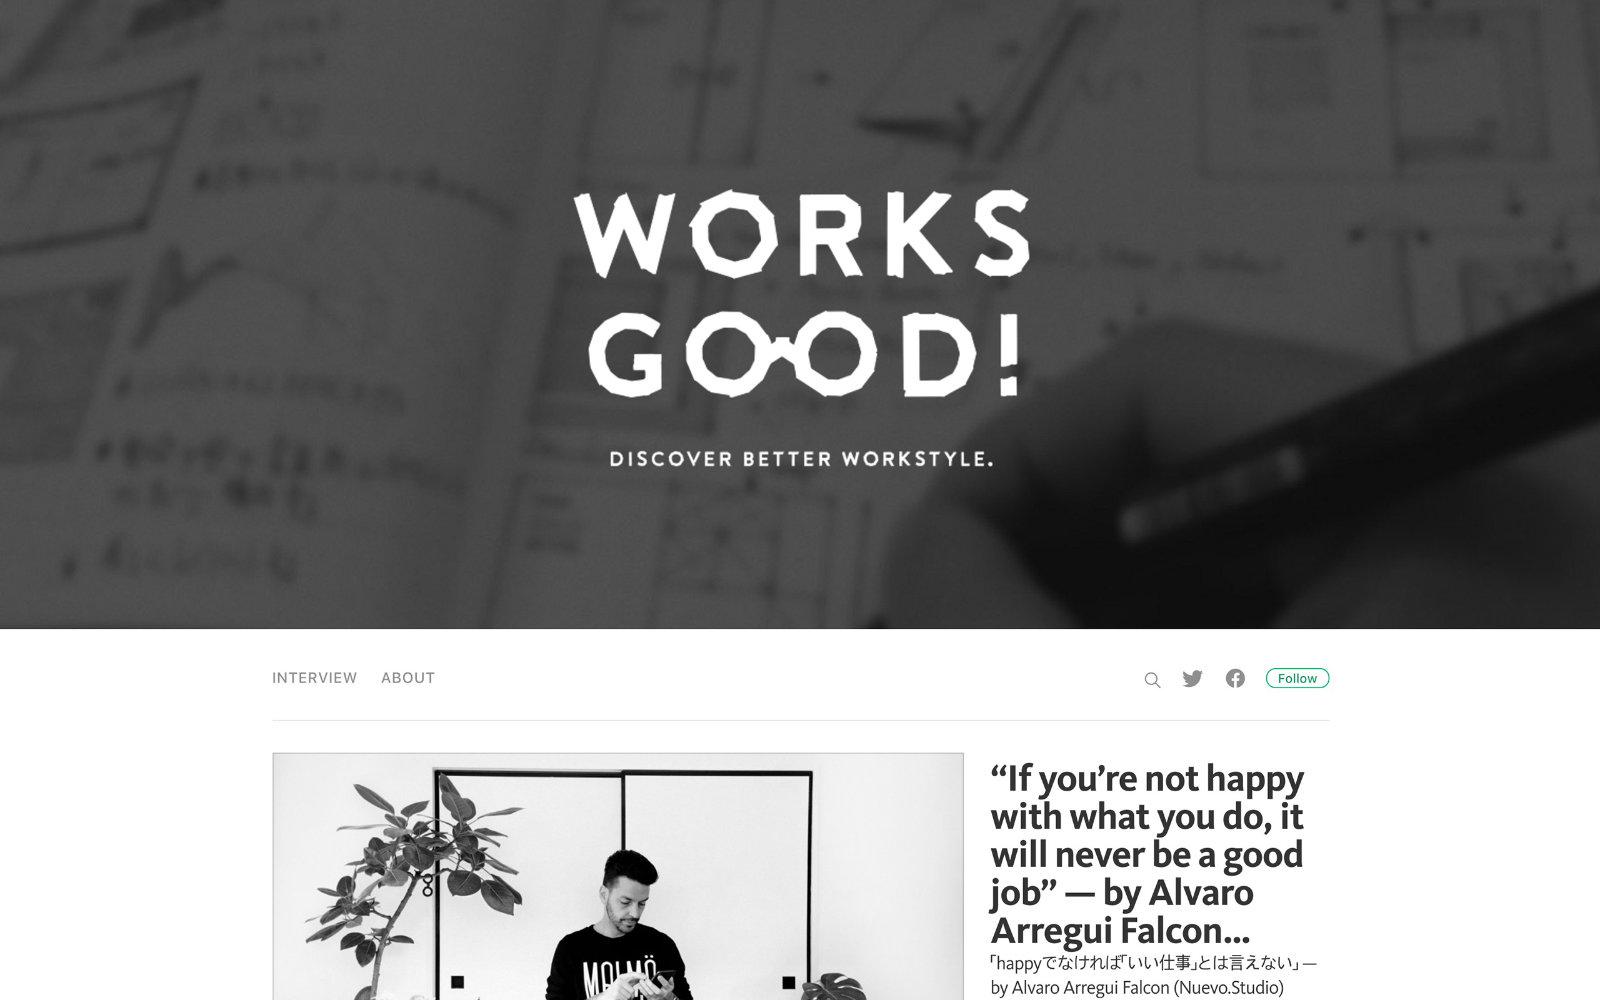 WORKS GOOD!